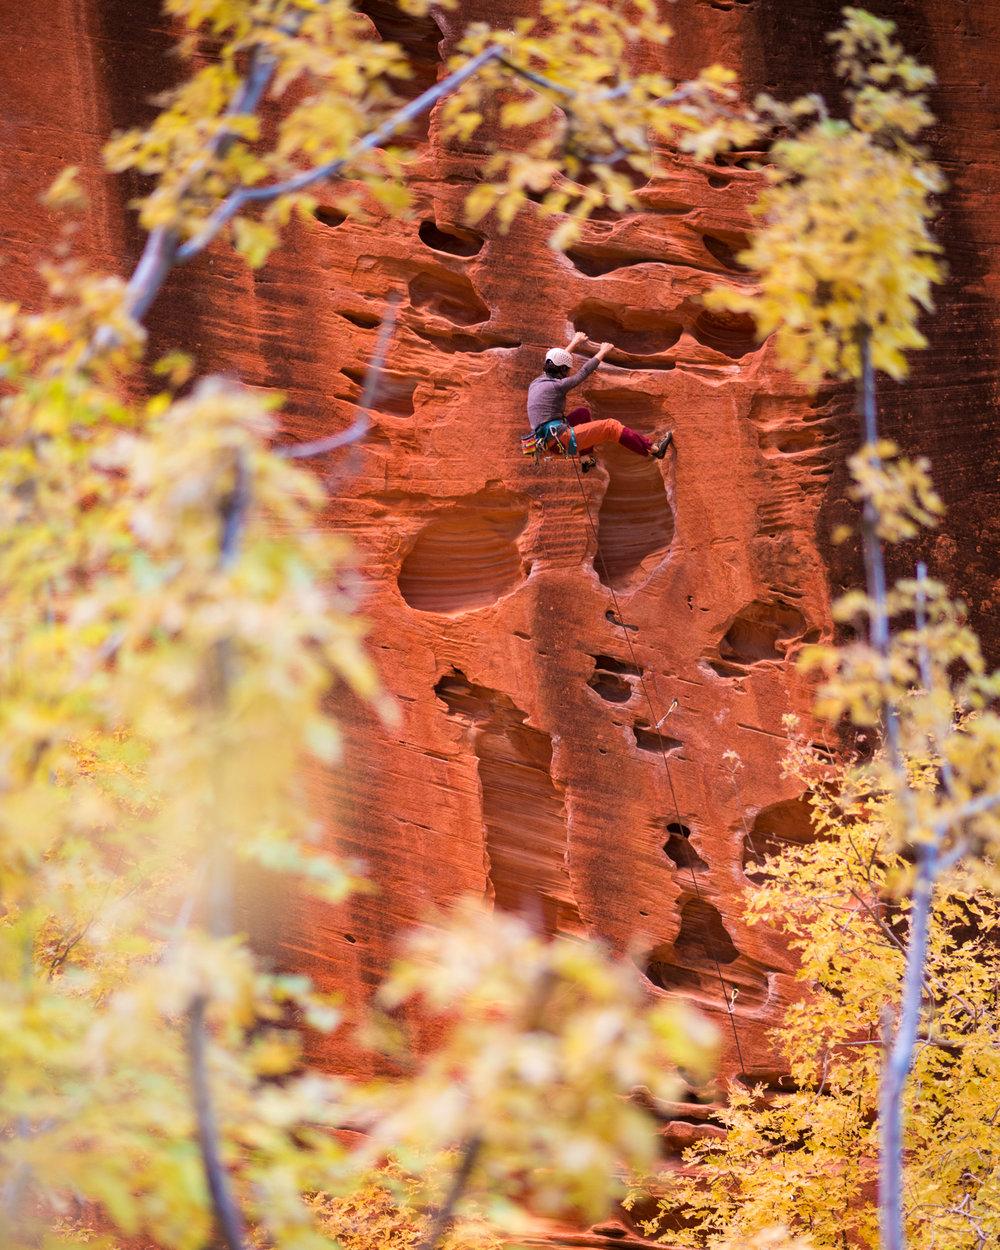 Miles Weaver_Zion National Park_Kolob Canyon_Namaste Wall_climbing.jpg